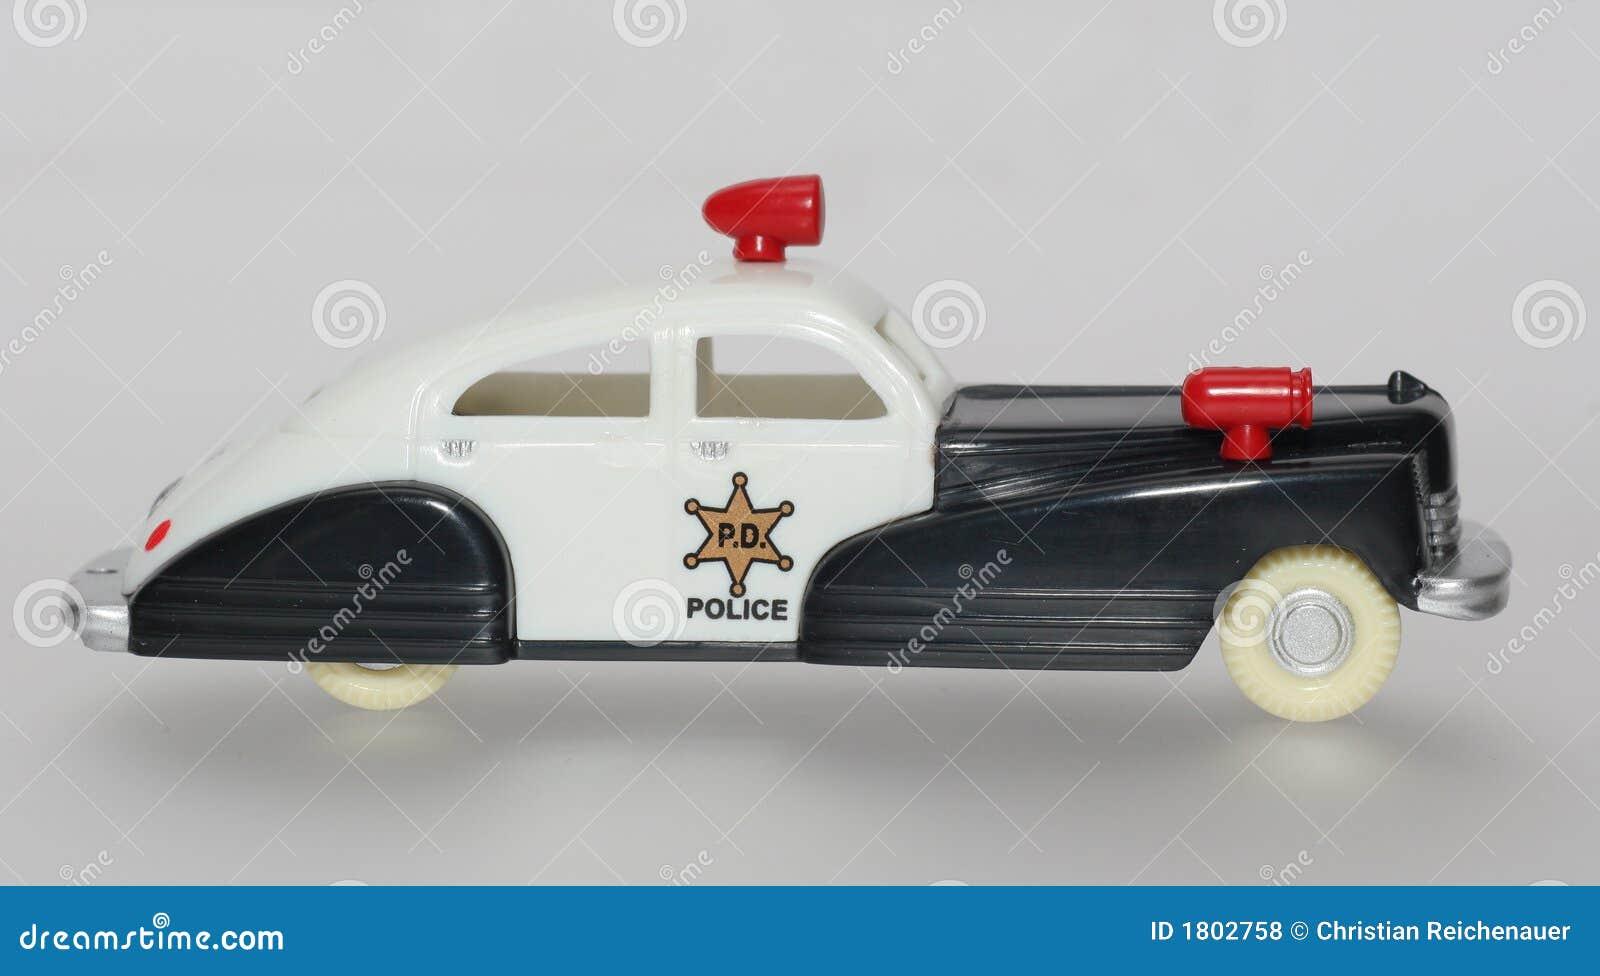 toy police car royalty free stock photos